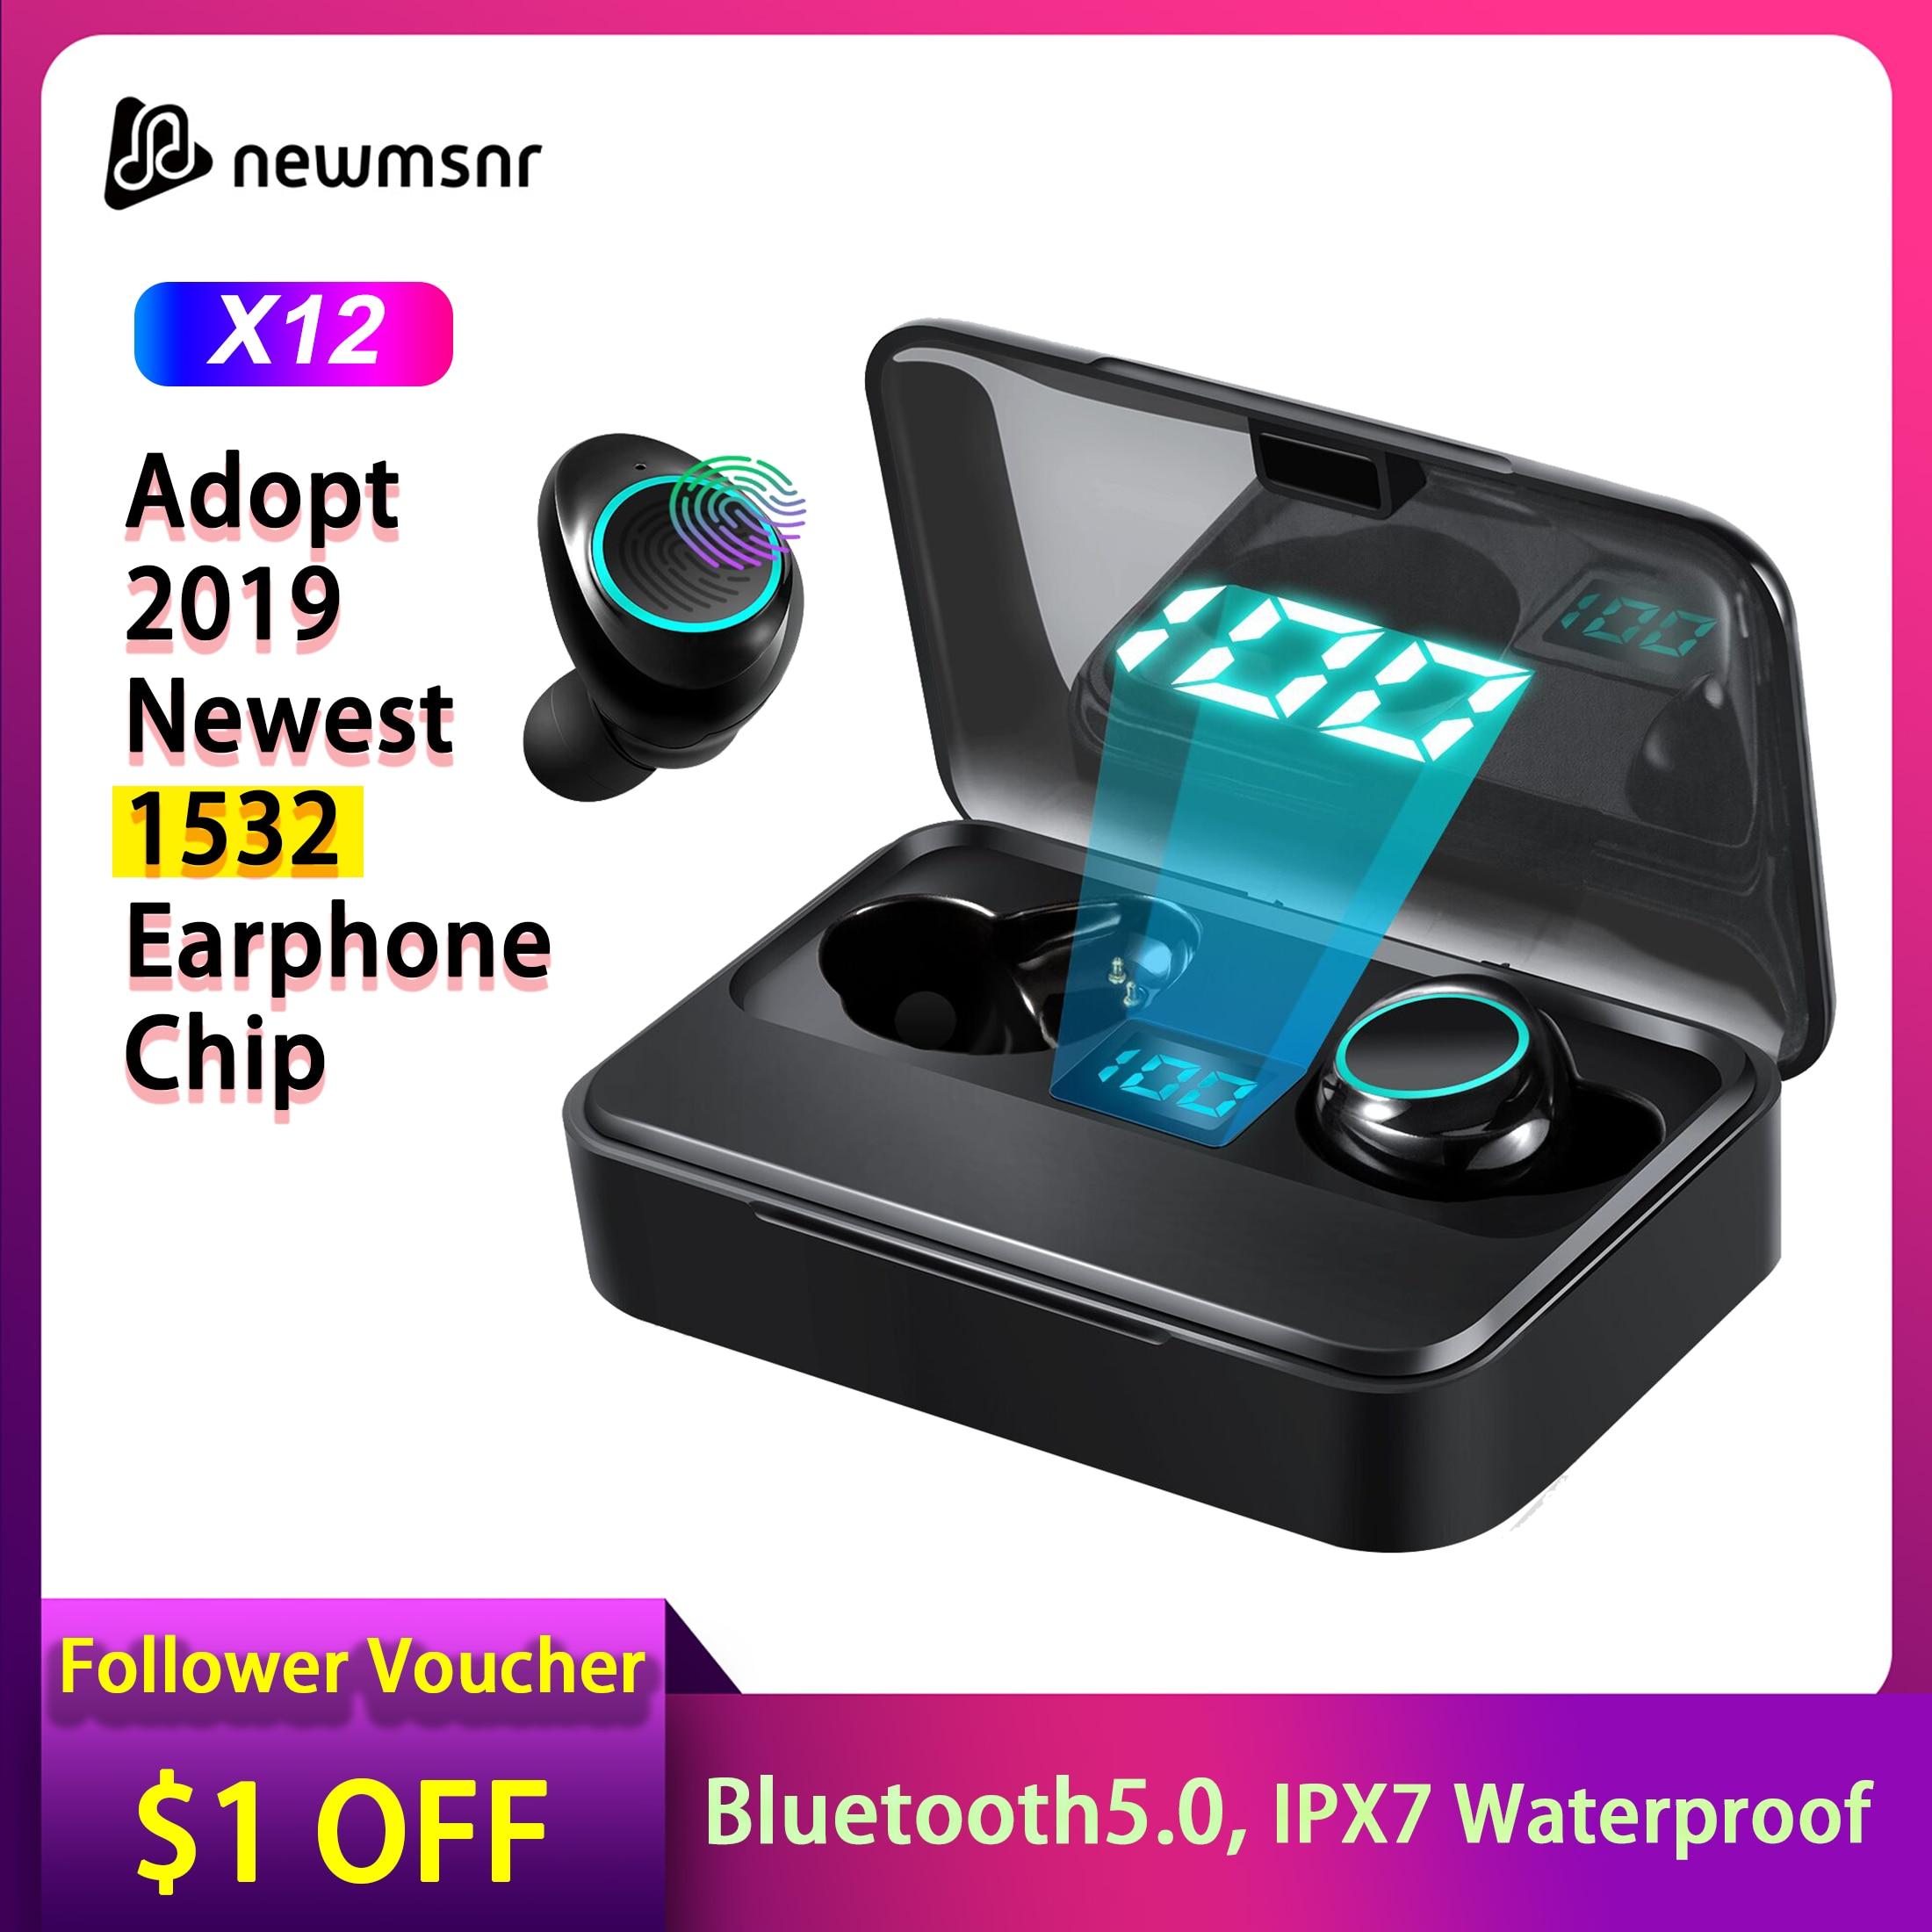 2019 X12 TWS 5.0 Bluetooth Earphone 9D Stereo Wireless Earpiece IPX7 Waterproof 3500mAh LED For Xiaomi Huawei IPhone Samsung